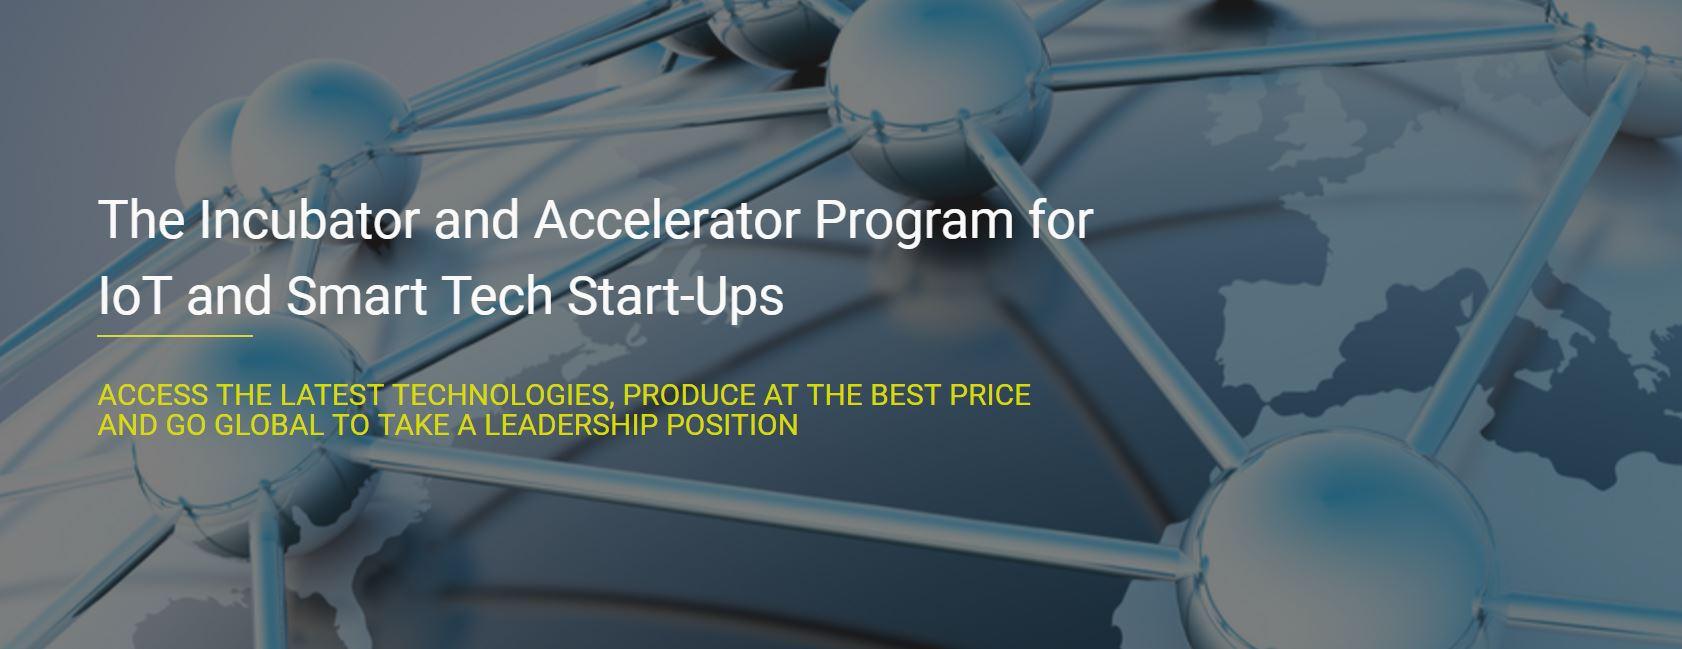 accelerator incobator program incubare startup antreprenor io2 hub viena